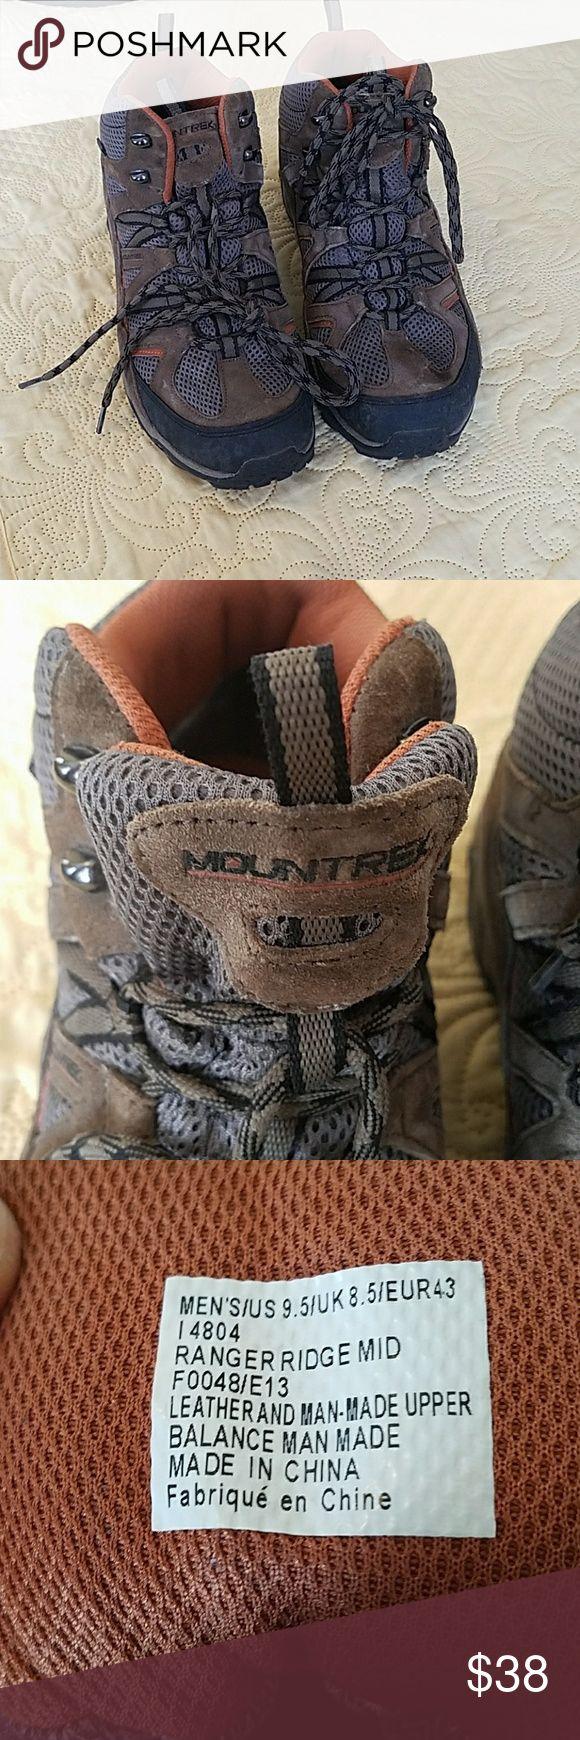 Merrill mountrek waterproof hiking boots 9.5 Brown lightweight waterproof hiking boots Merrell Shoes Boots